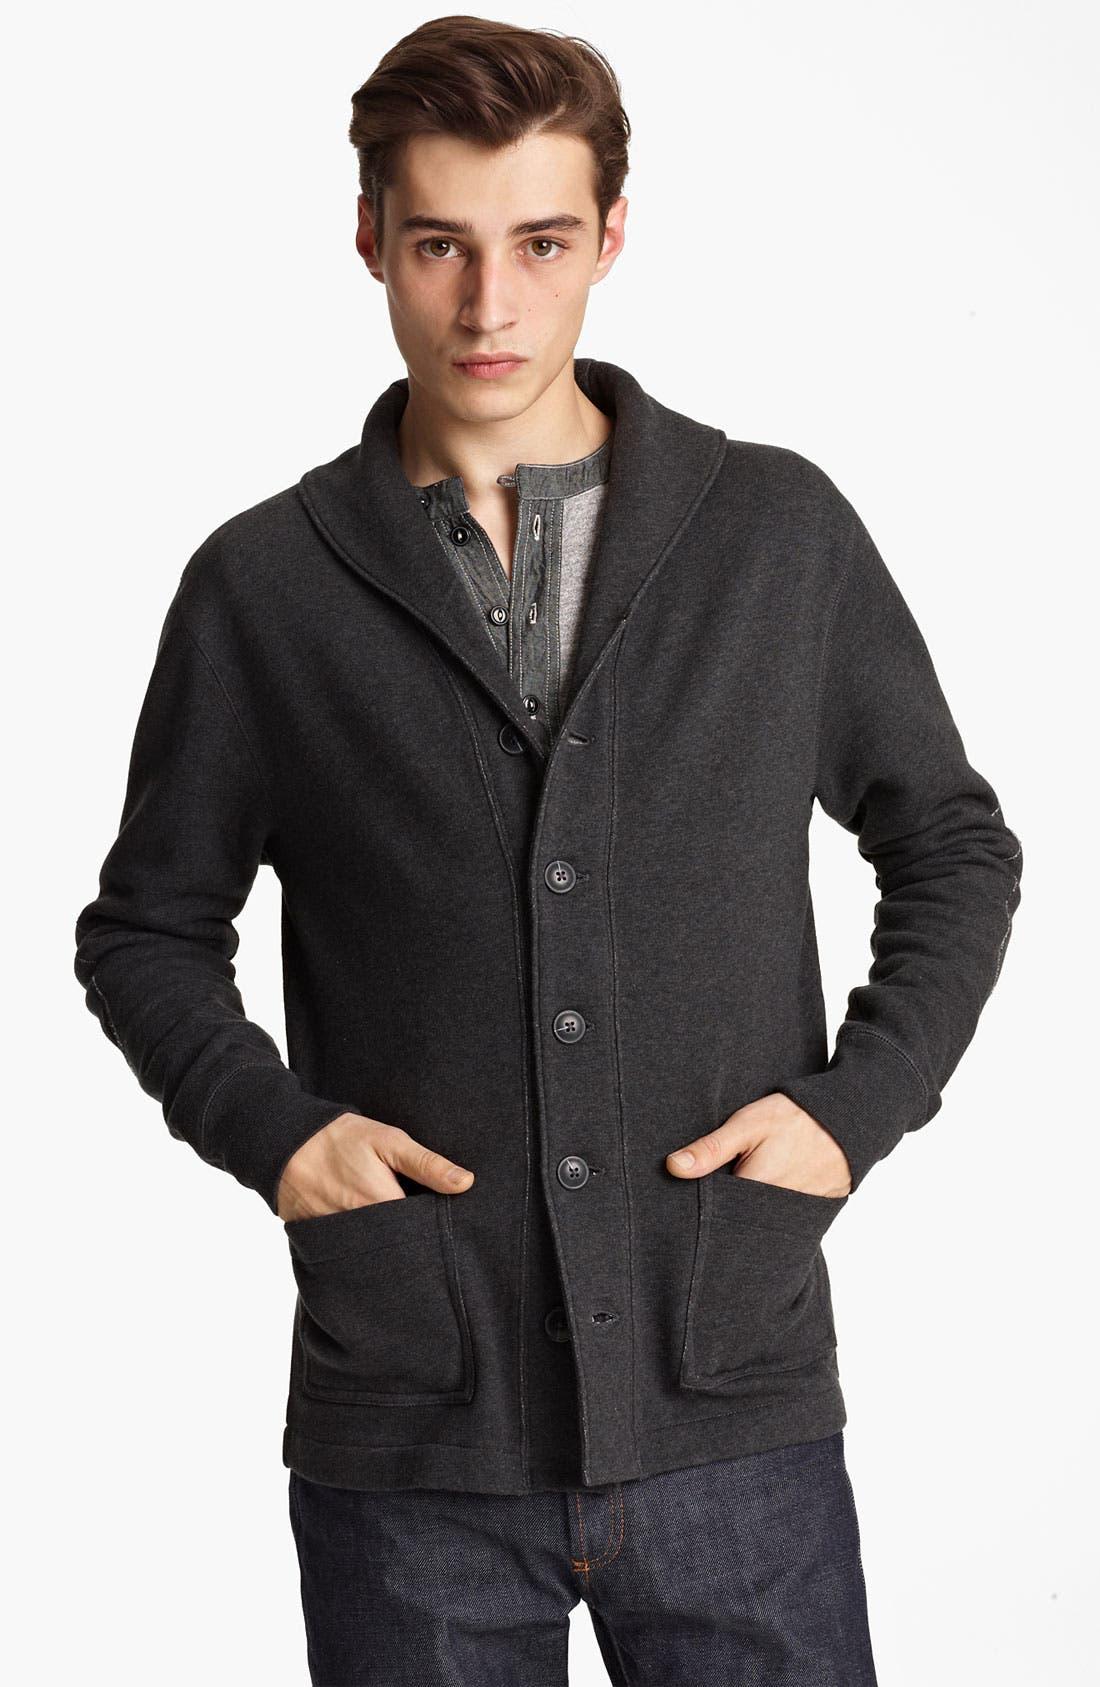 Alternate Image 1 Selected - Grayers Shawl Collar Button Cardigan